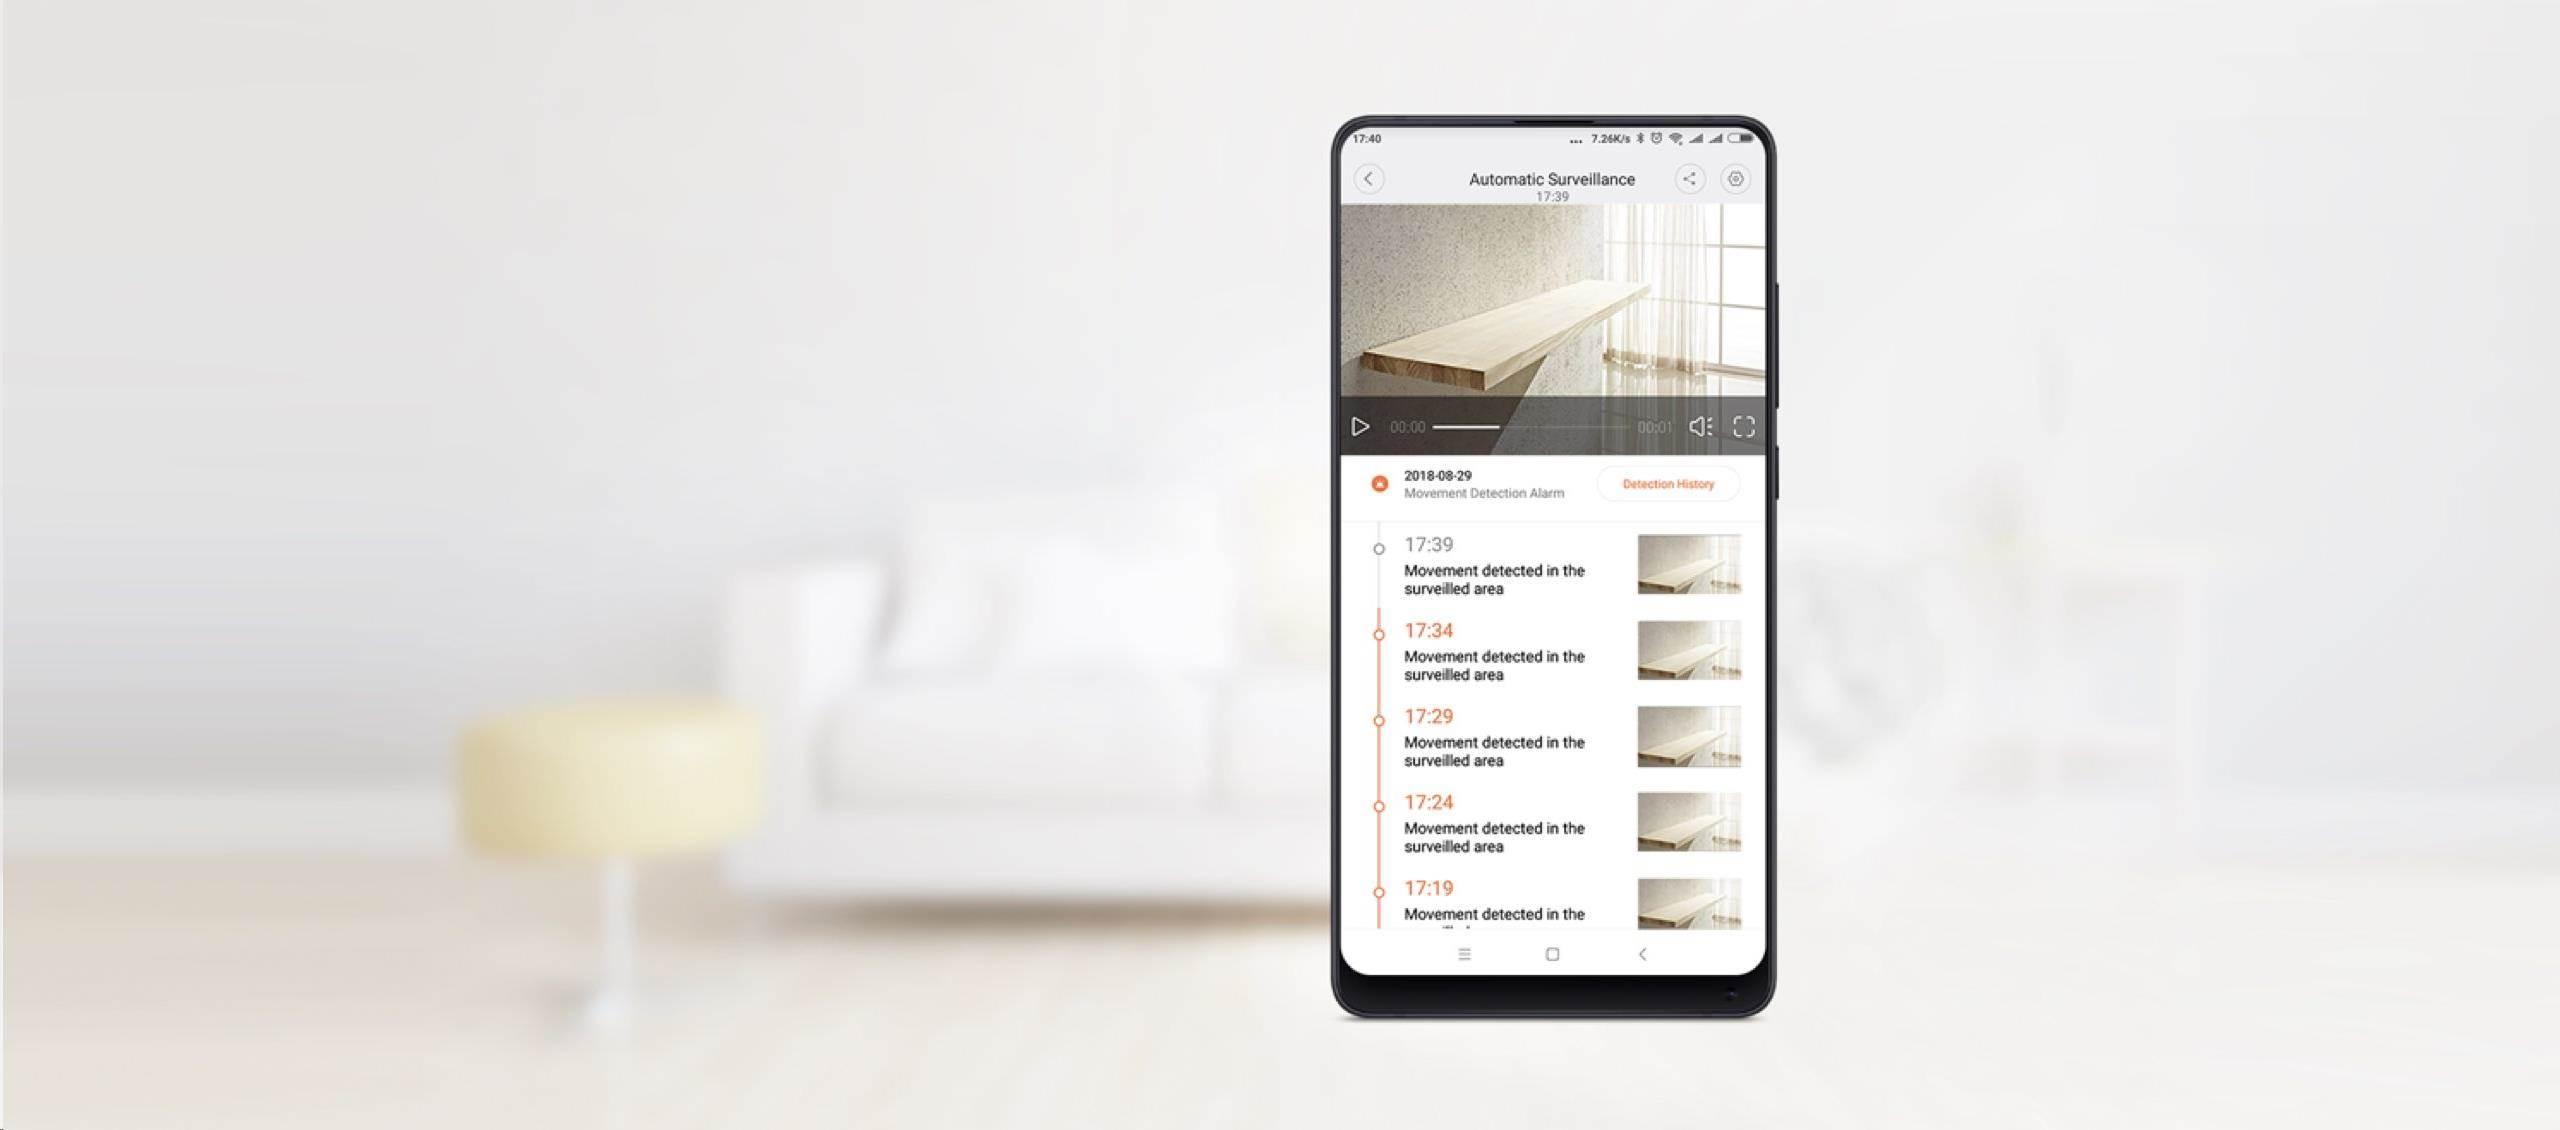 Xiaomi kamera detekcia pohyby notifikacia